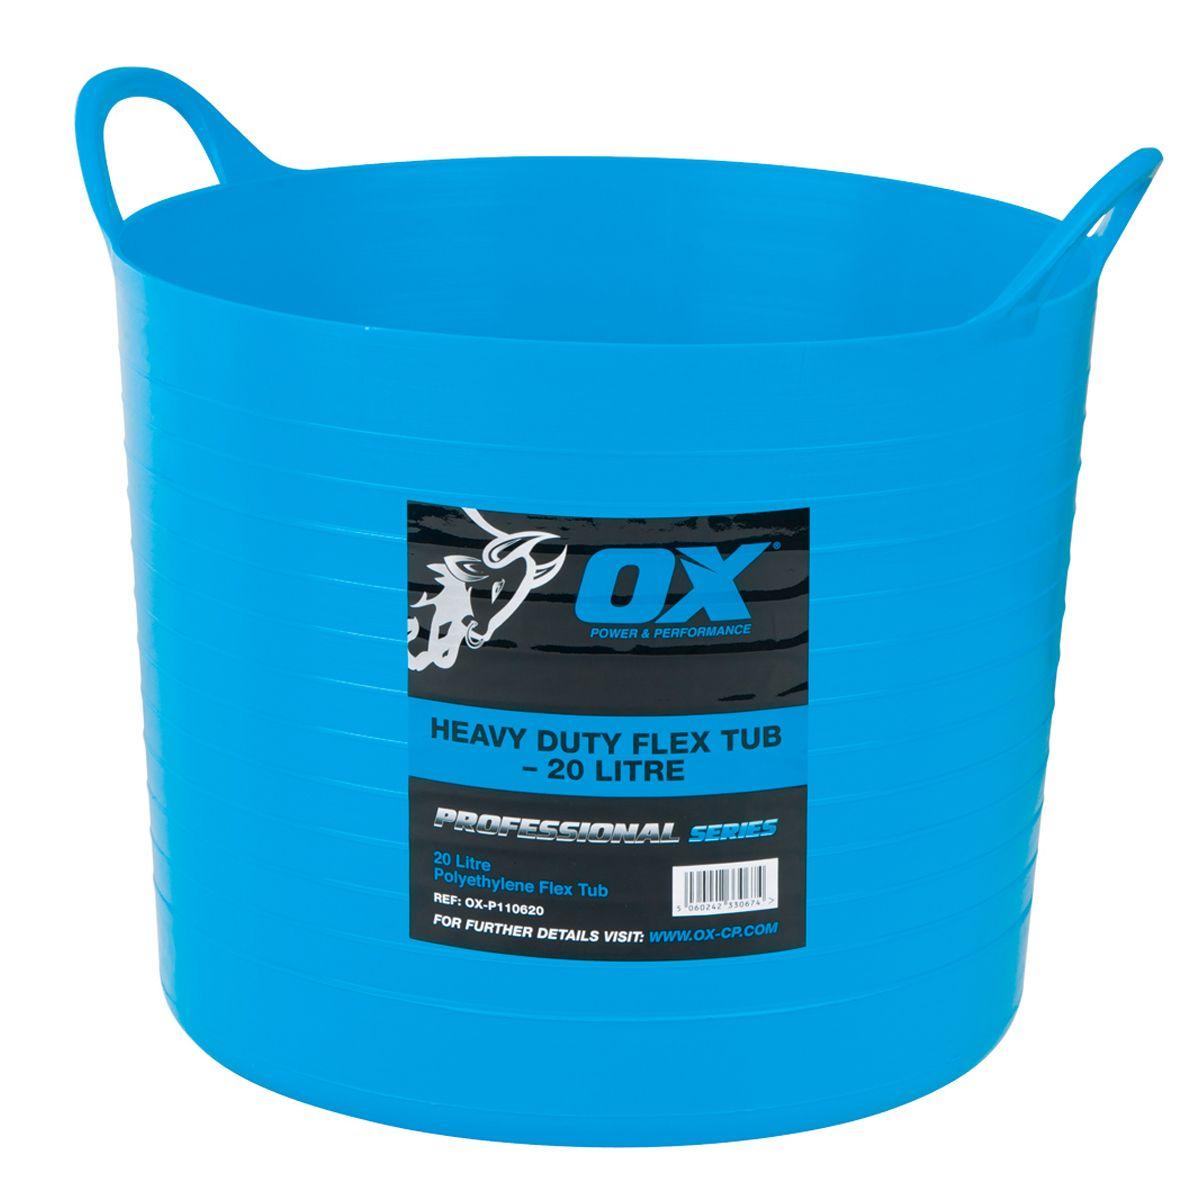 OX PRO HEAVY-DUTY FLEXI TUB 20L - OX-P110620